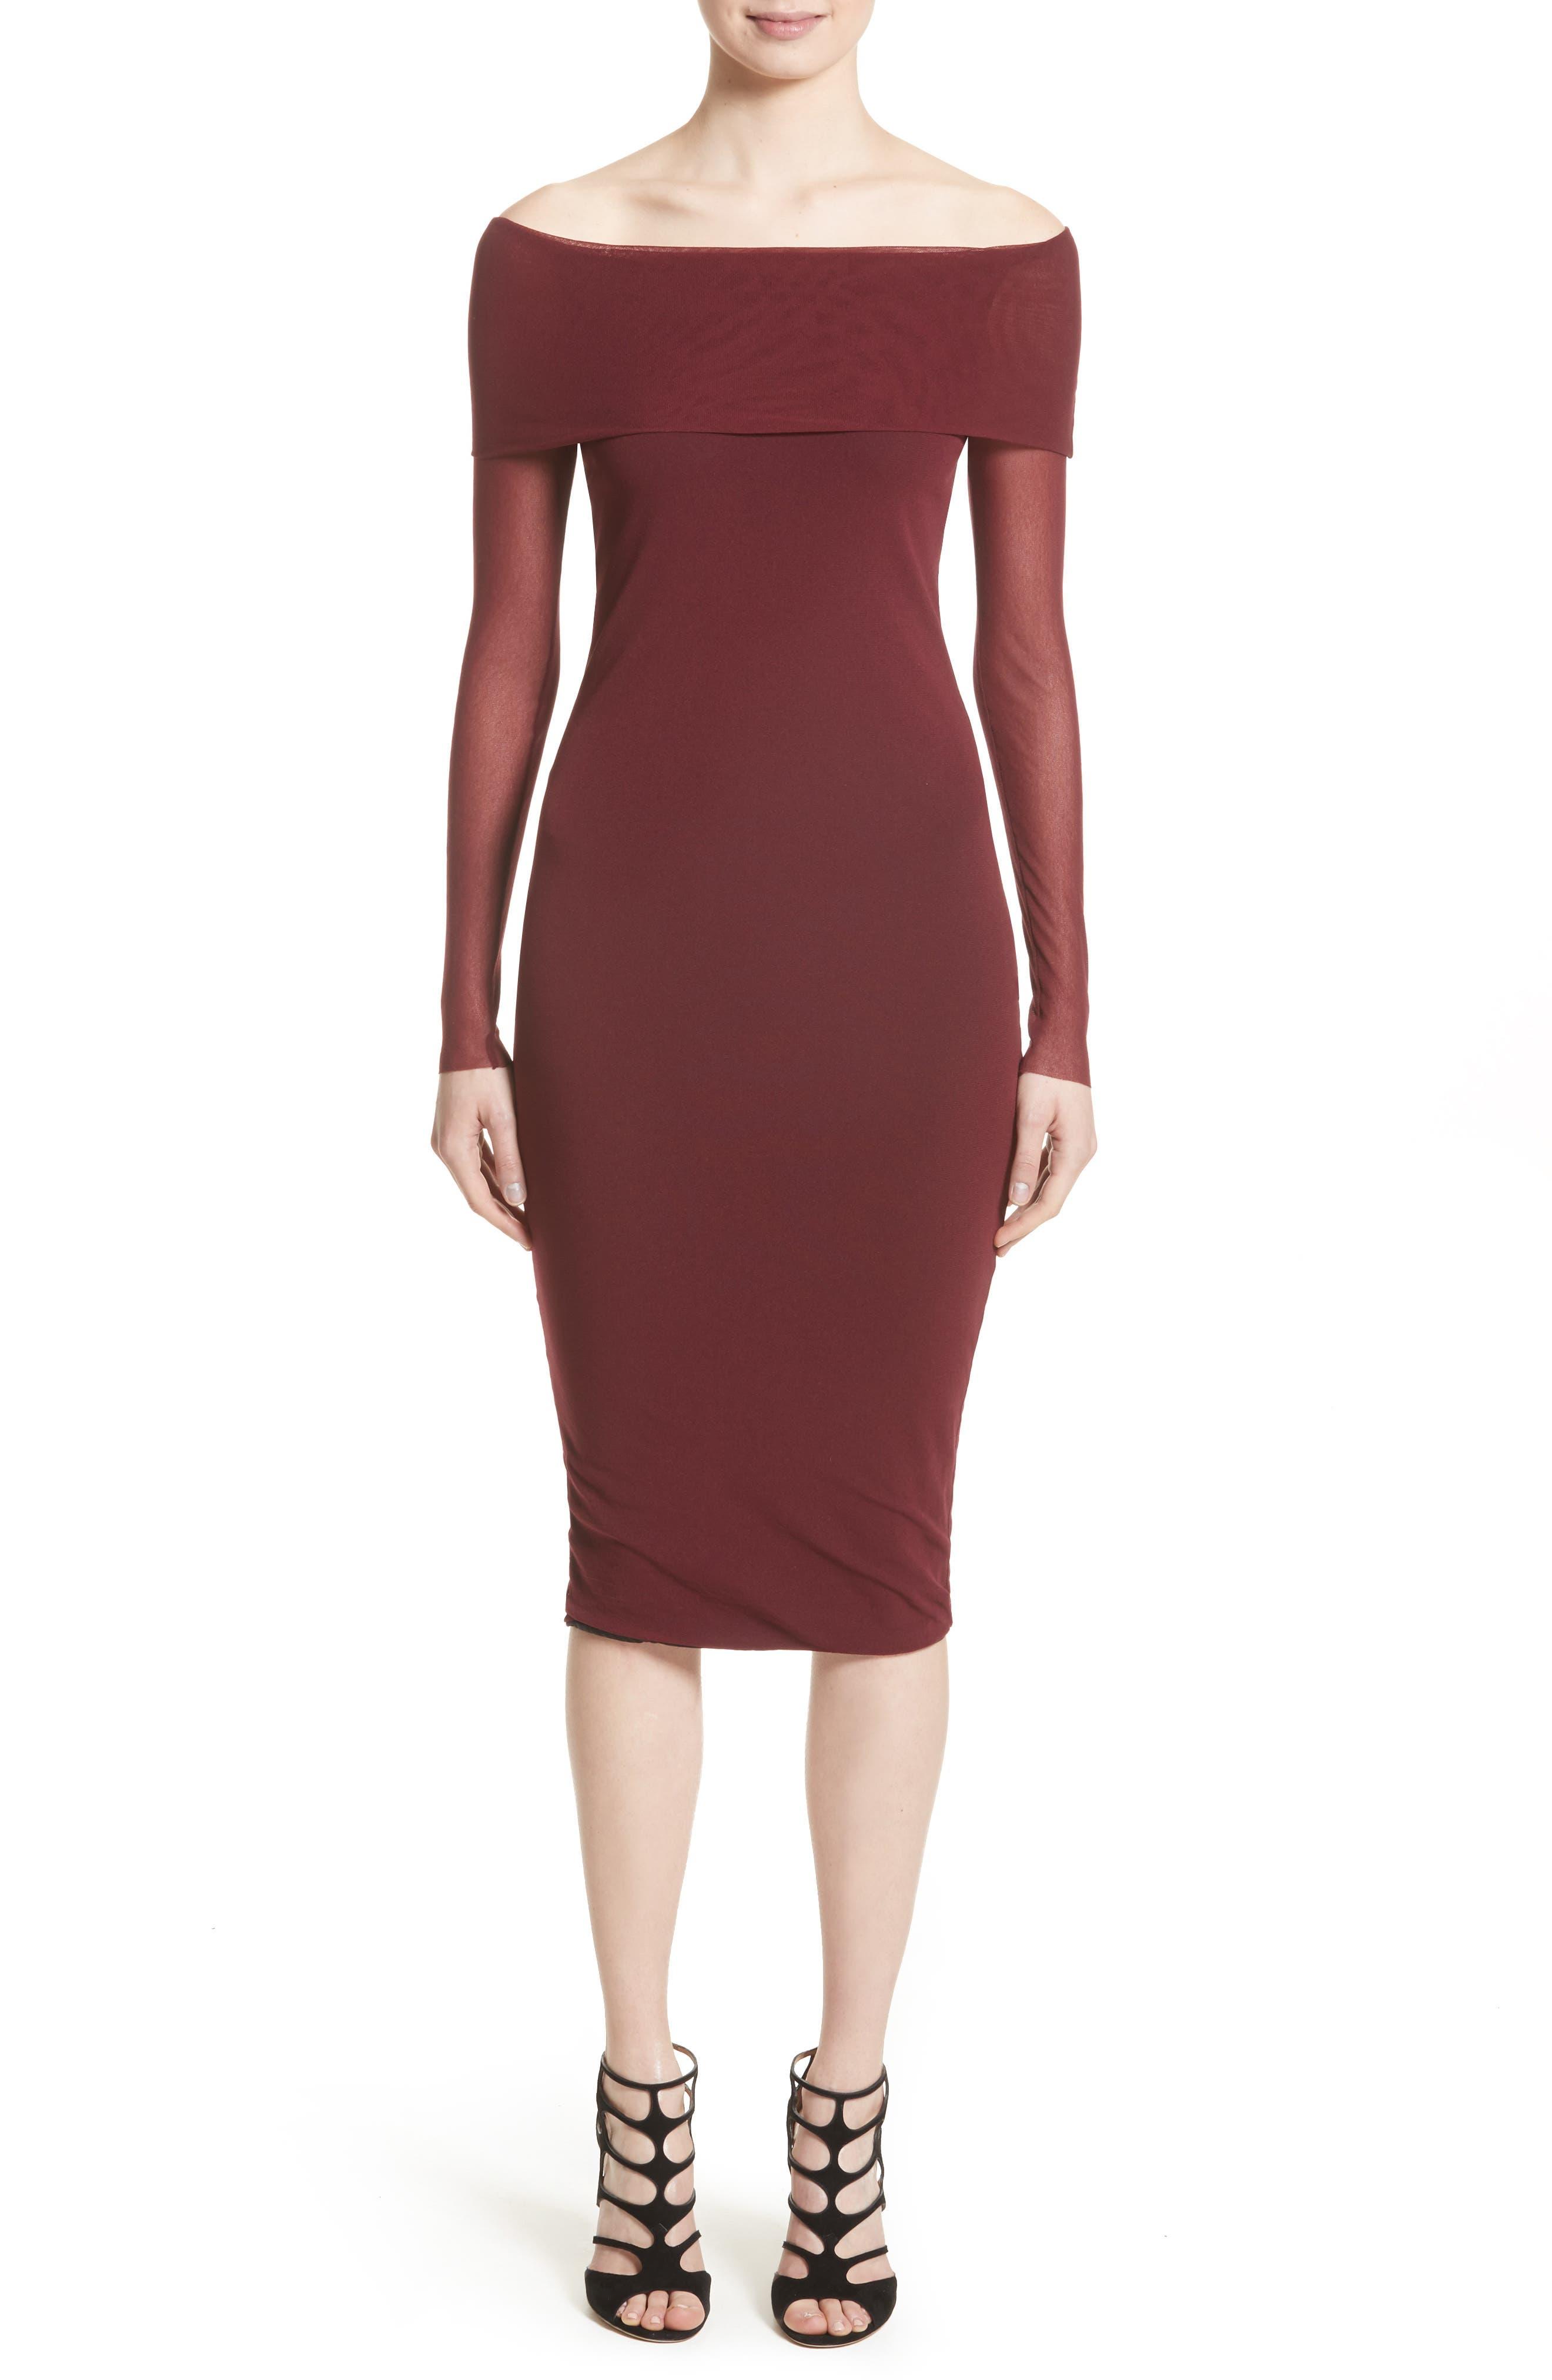 Alternate Image 1 Selected - Fuzzi Tulle Off the Shoulder Midi Dress